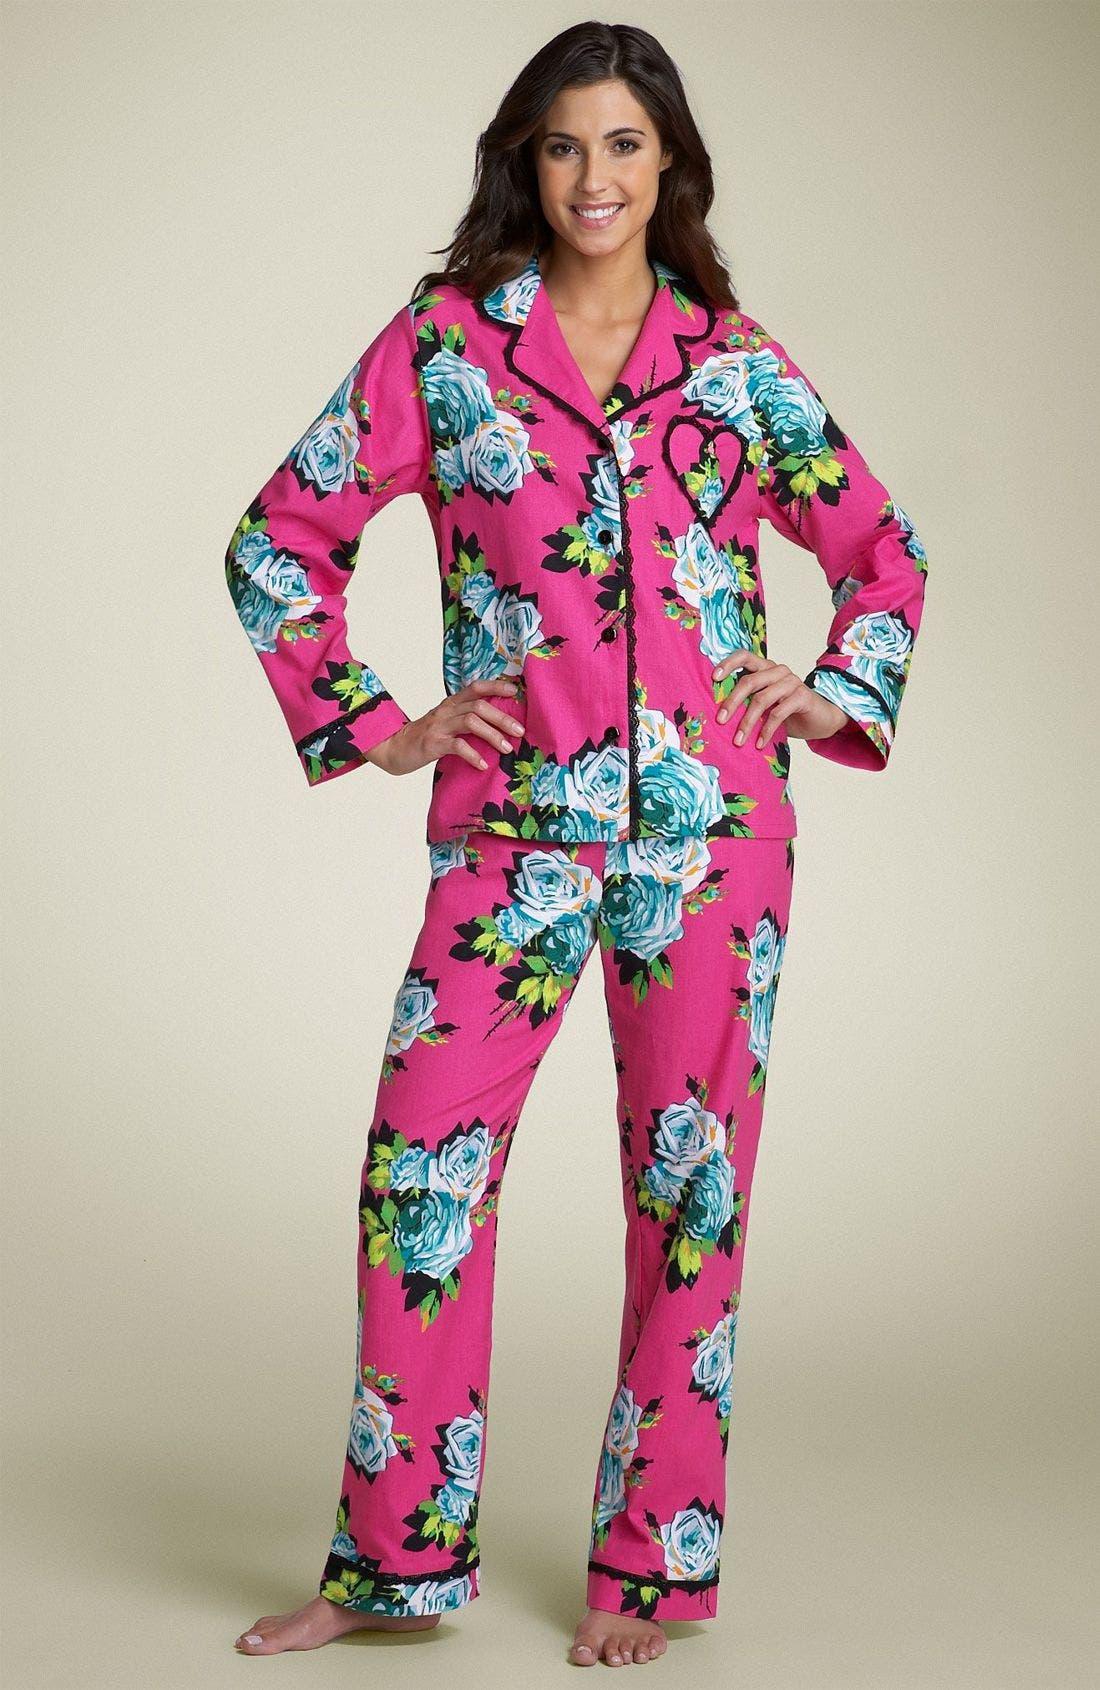 Floral Flannel Pajamas,                             Main thumbnail 1, color,                             693